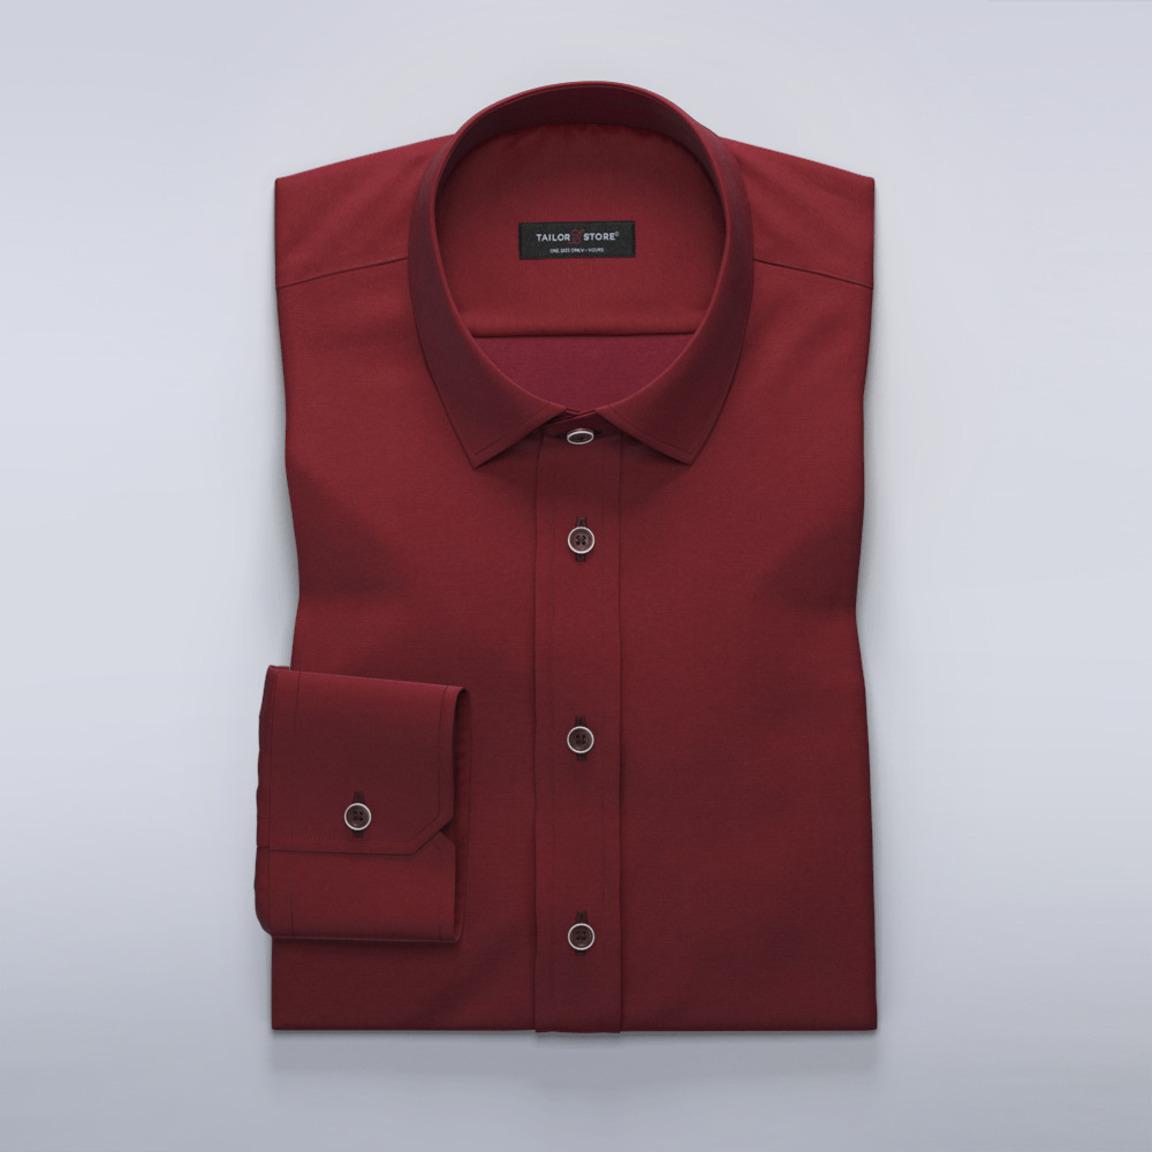 Weinrotes Stretch-Hemd